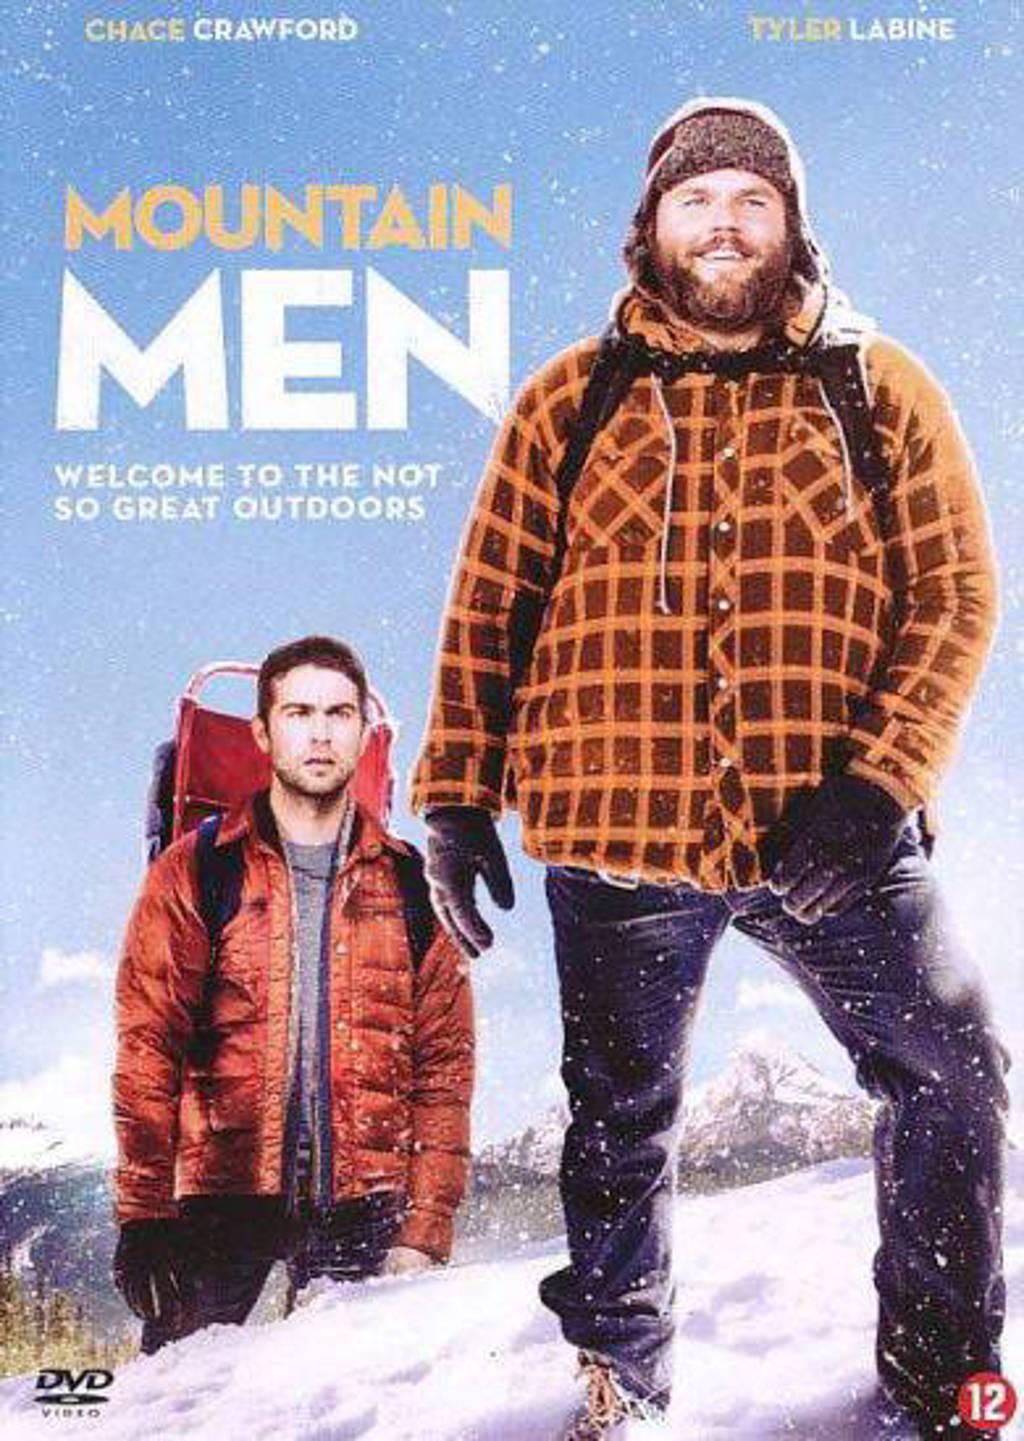 Mountain men (DVD)